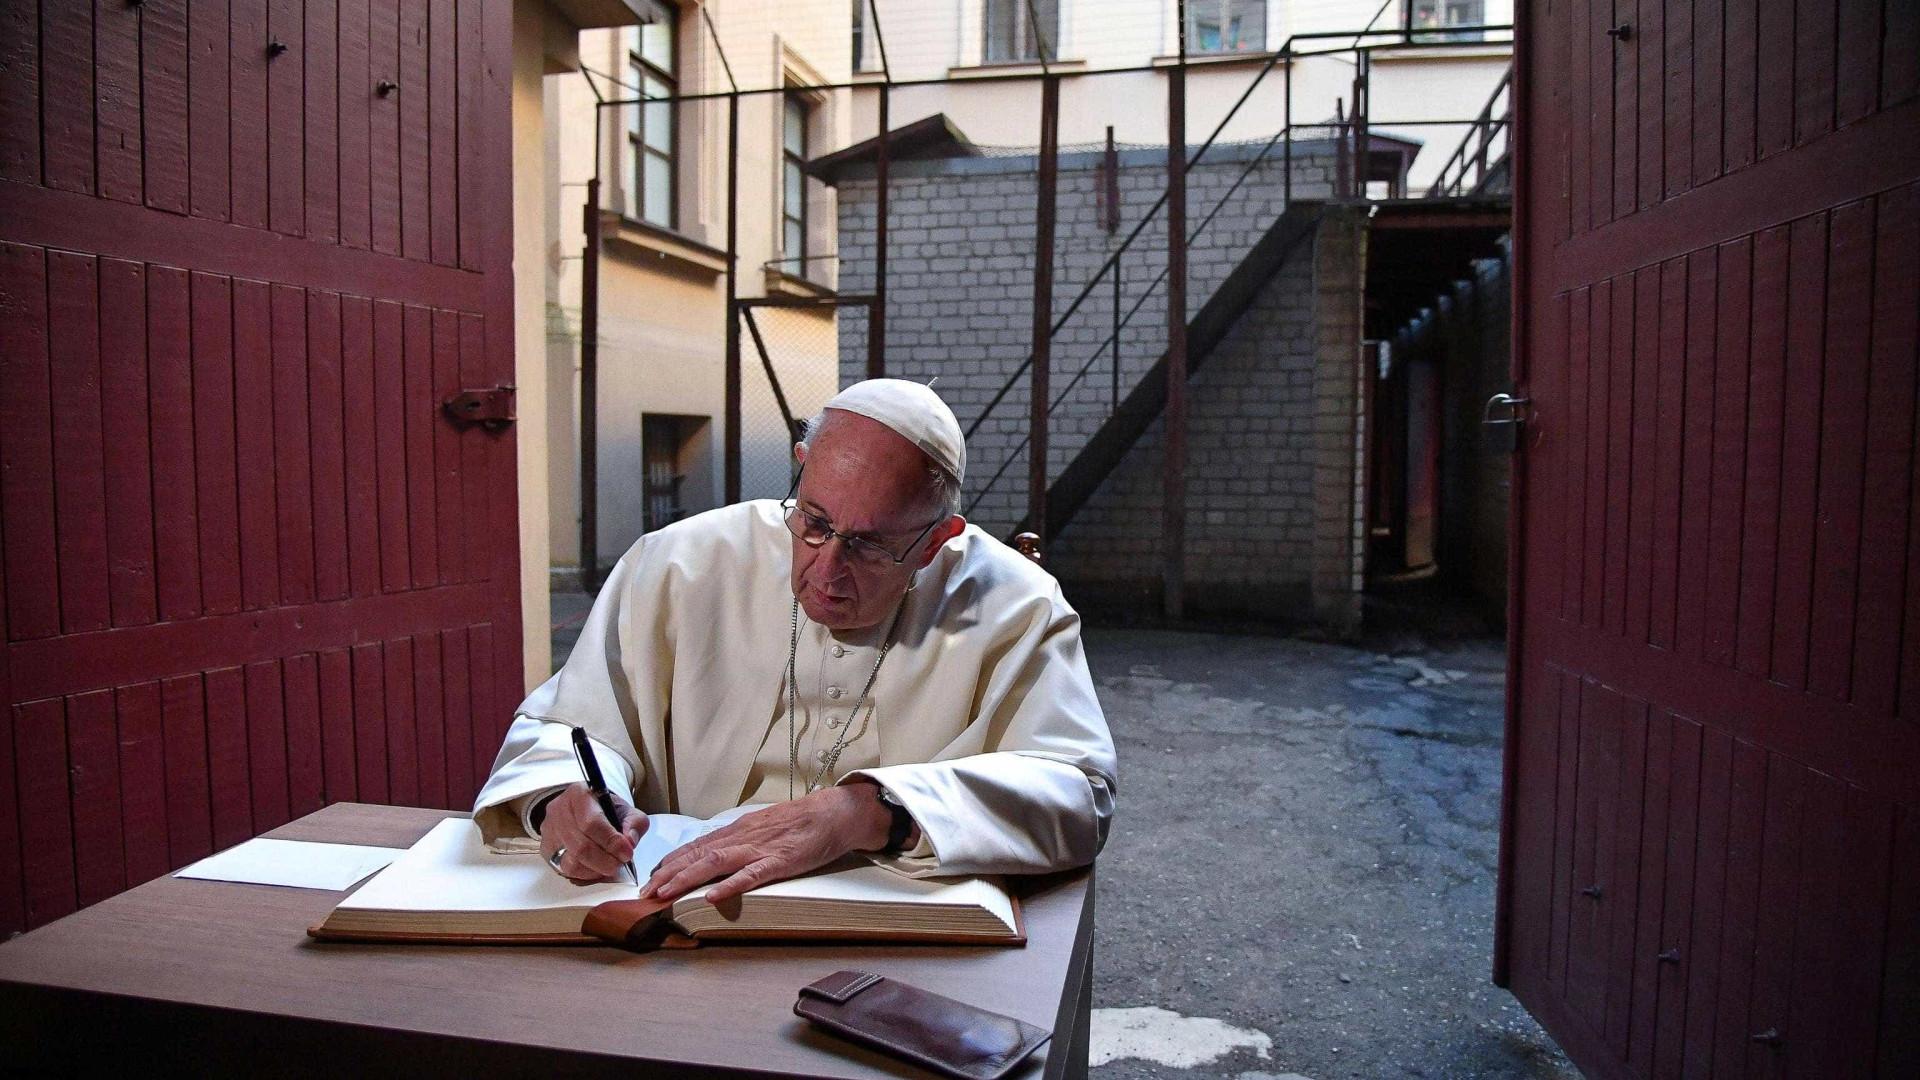 Papa Francisco alerta para reaparecimento do antissemitismo